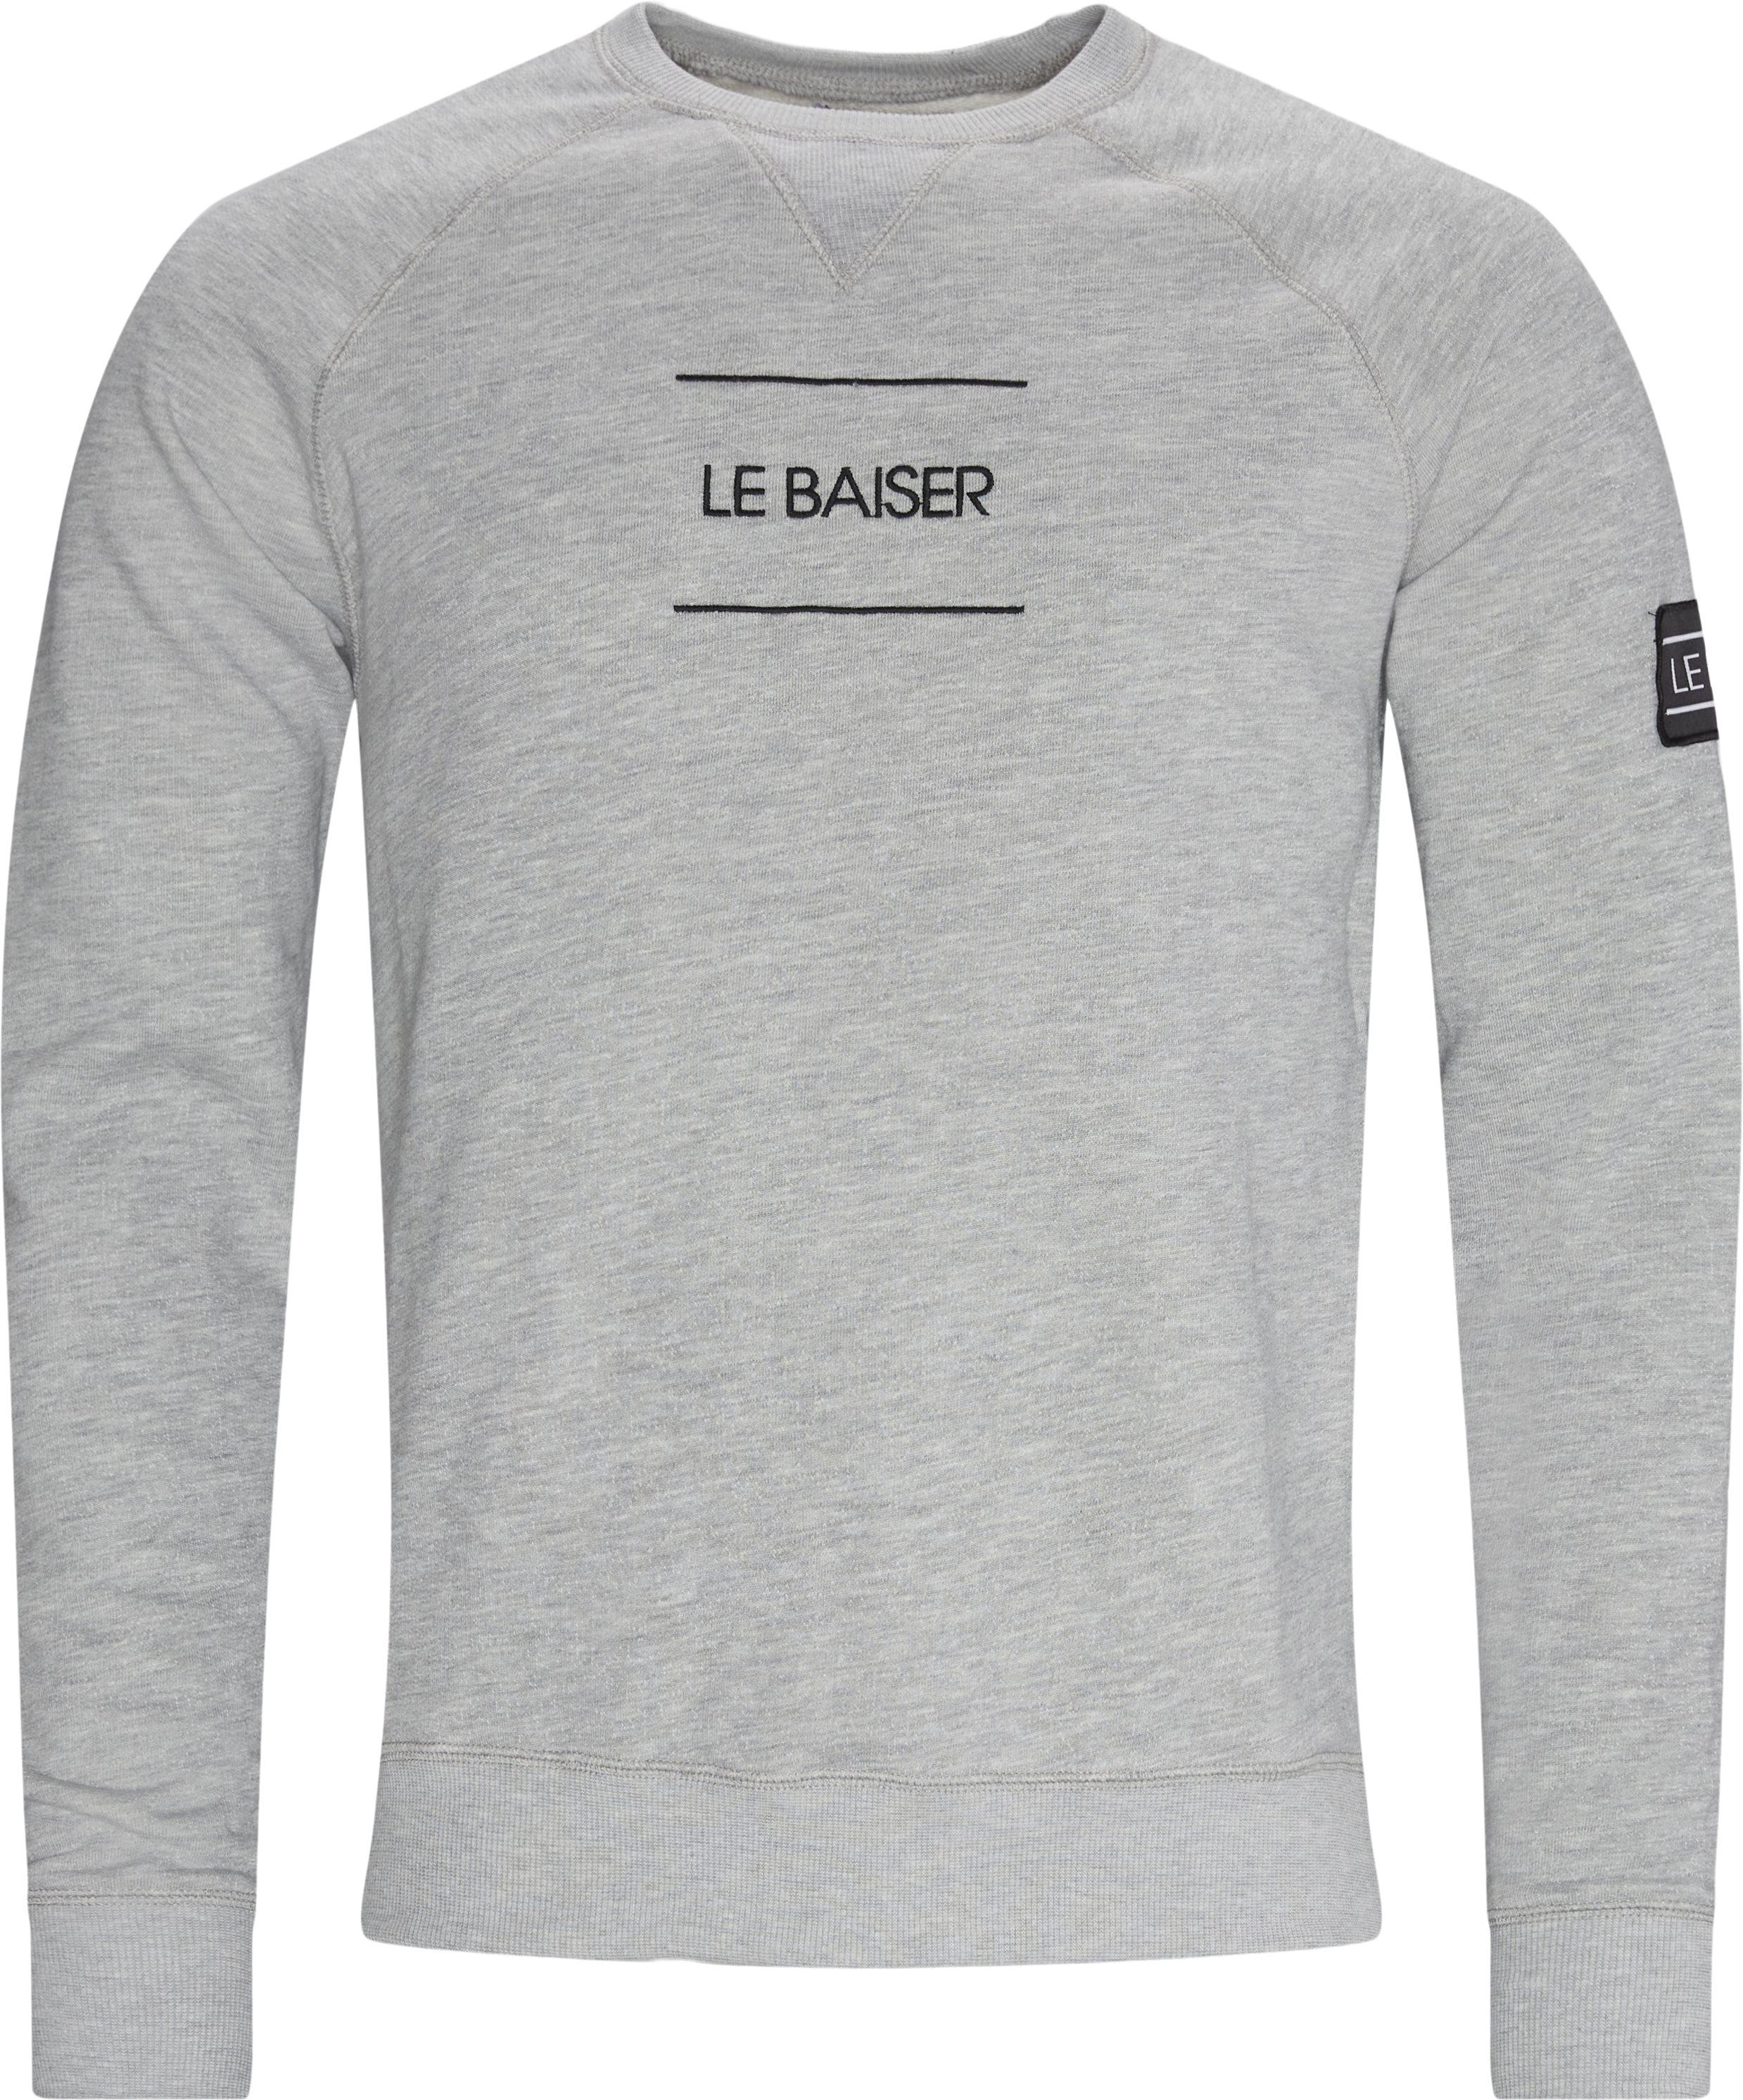 Bayonne Crewneck Sweatshirt - Sweatshirts - Regular - Grå